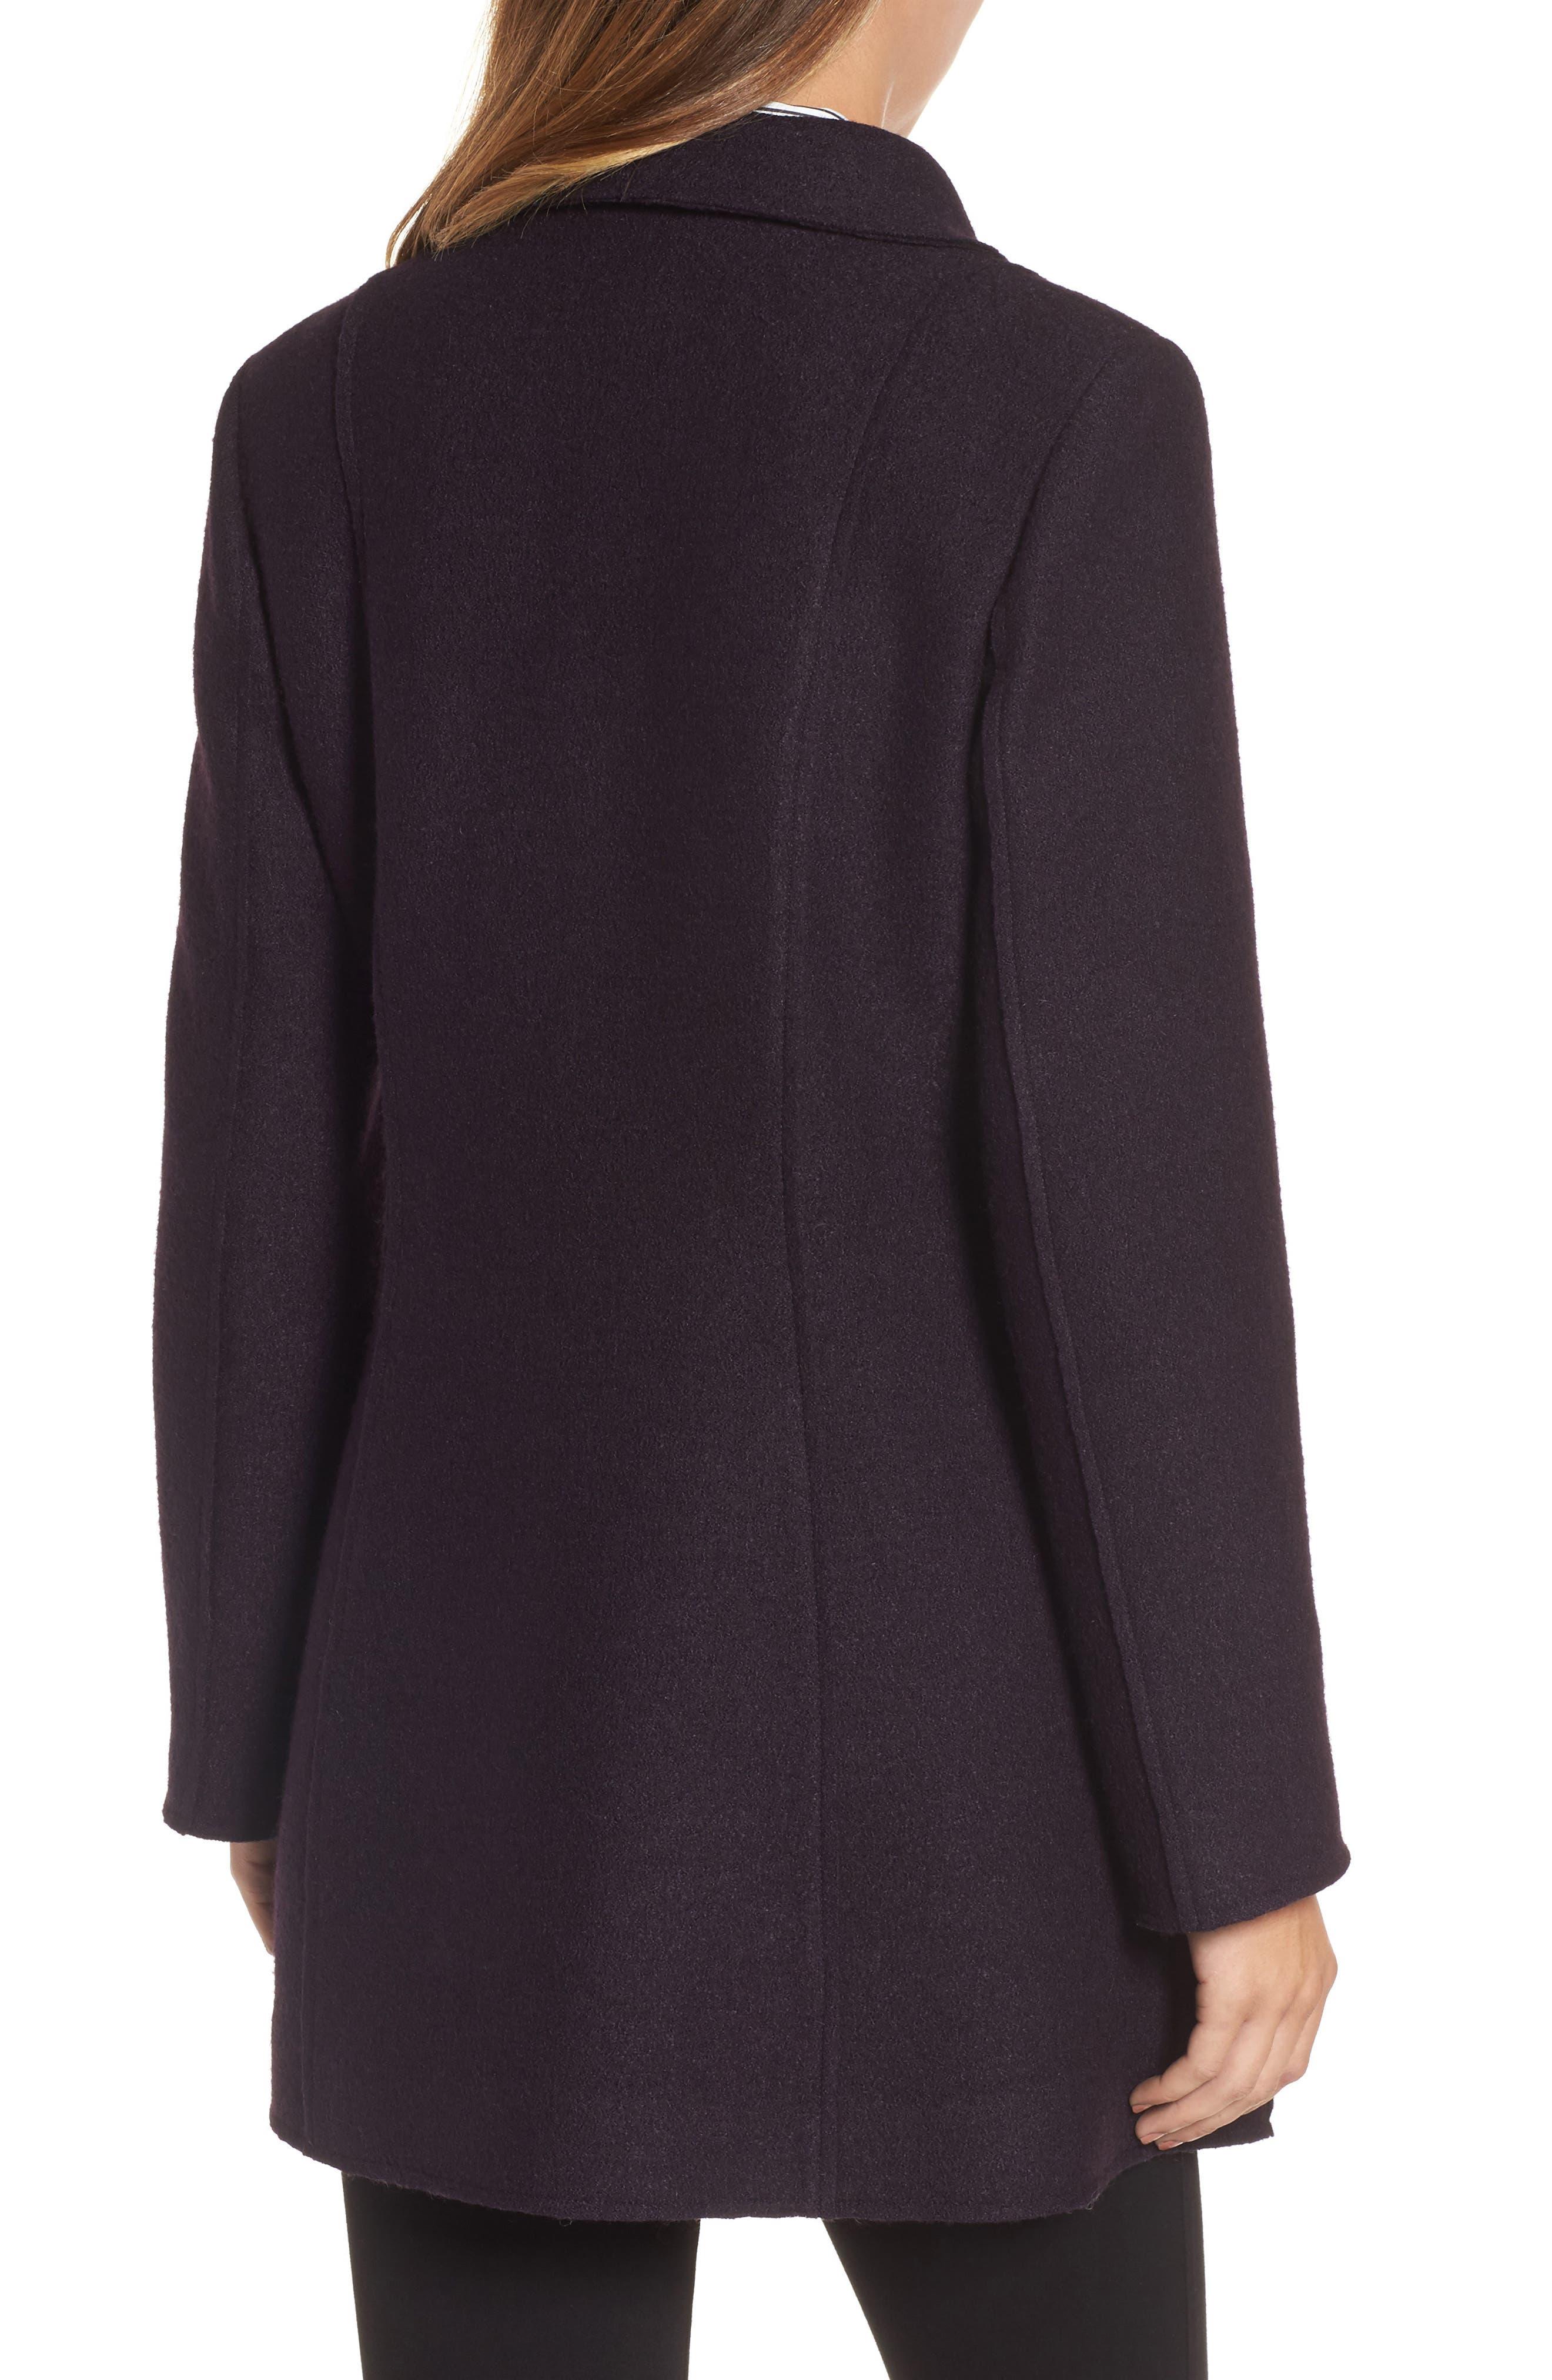 HALOGEN<SUP>®</SUP>, Asymmetrical Zip Boiled Wool Blend Coat, Alternate thumbnail 2, color, 500